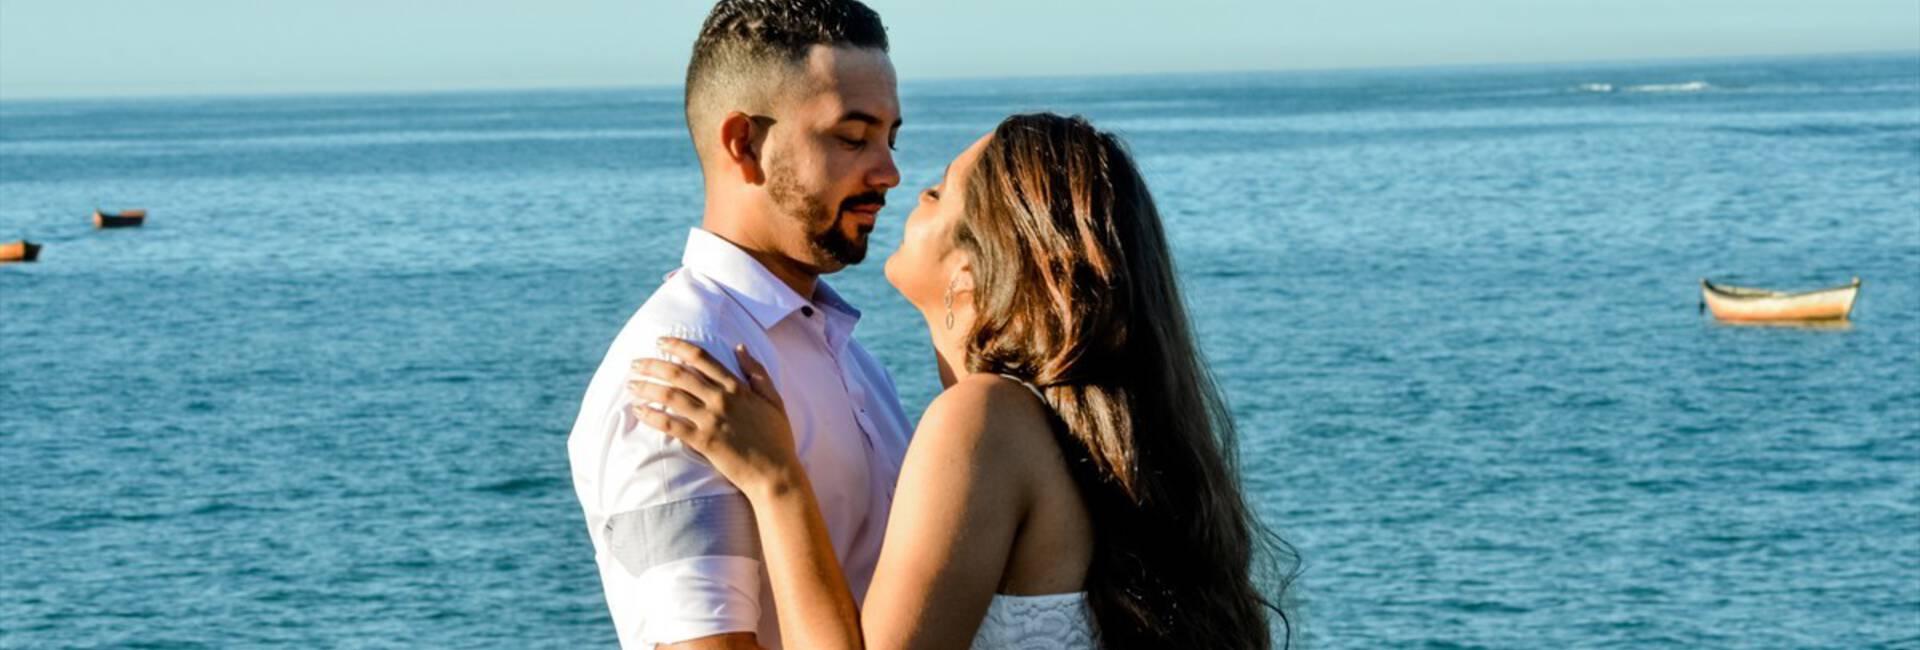 Pre-Wedding  de Praia de Setiba - Guarapari ES